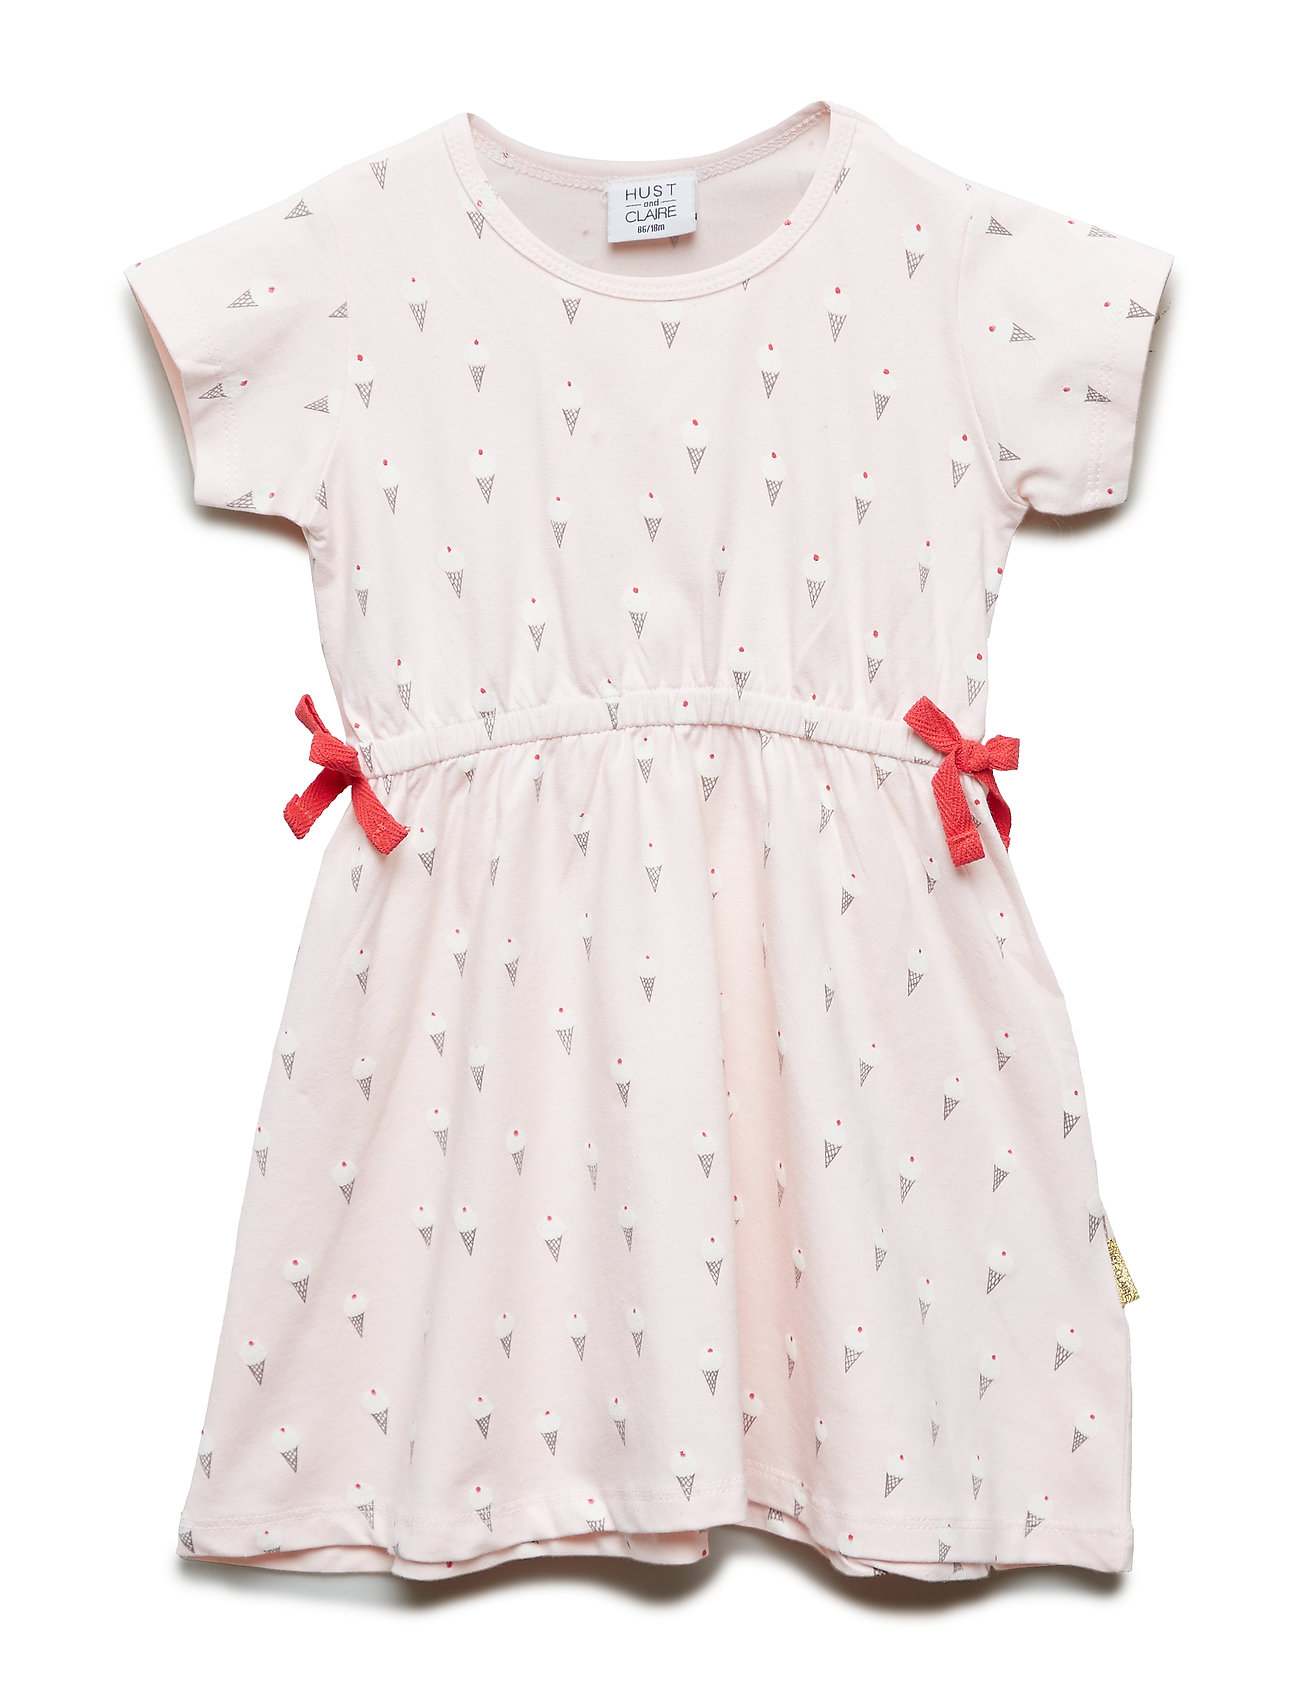 Hust & Claire Davina - Dress - NUDE PINK